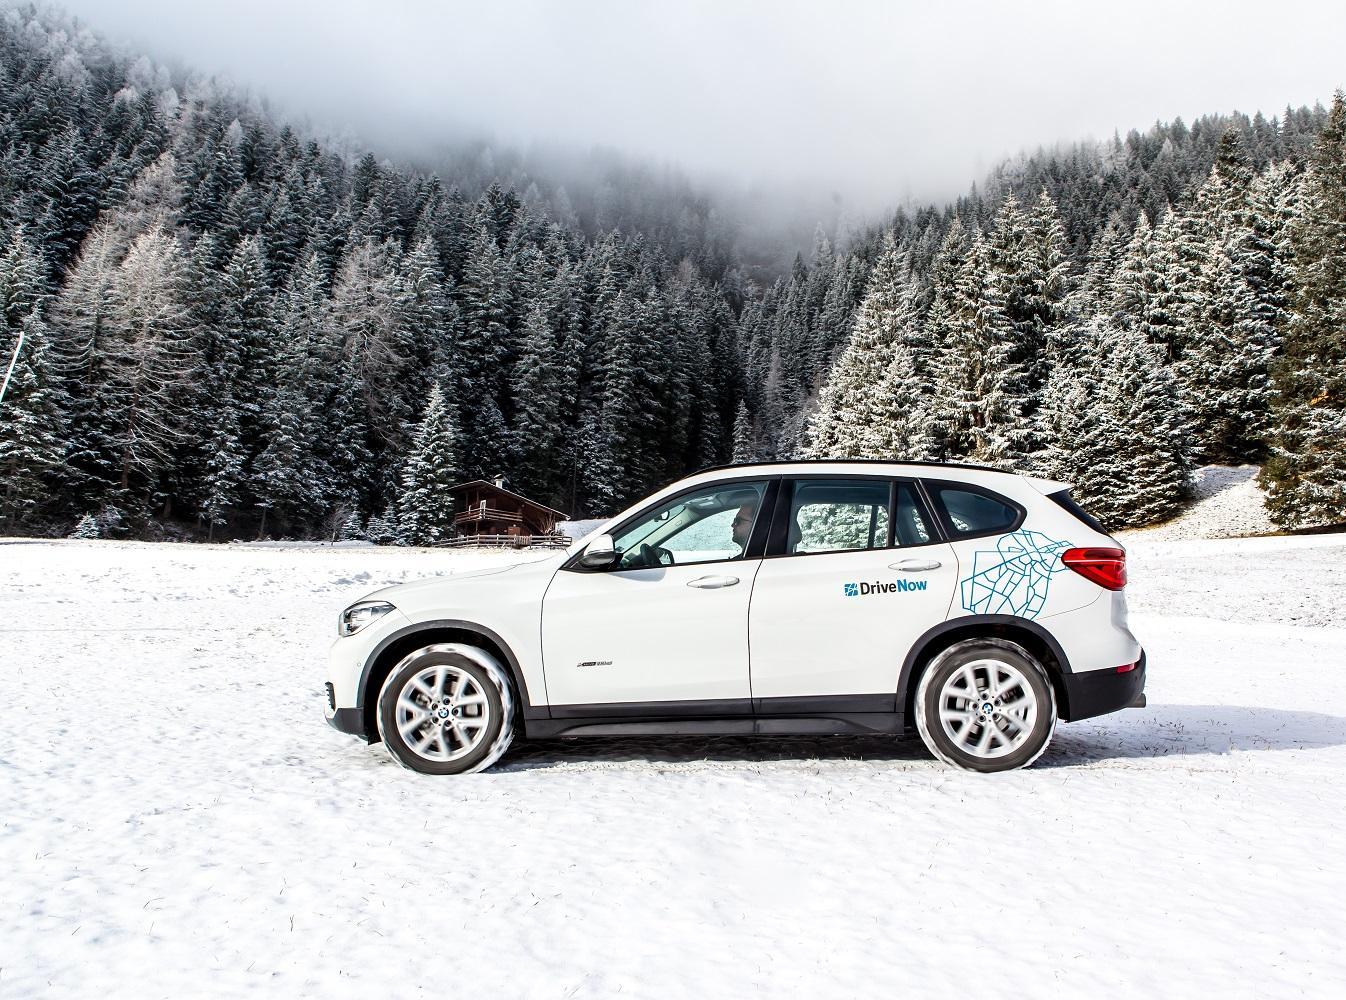 drivenow_bmw_x1_winter_driving_1